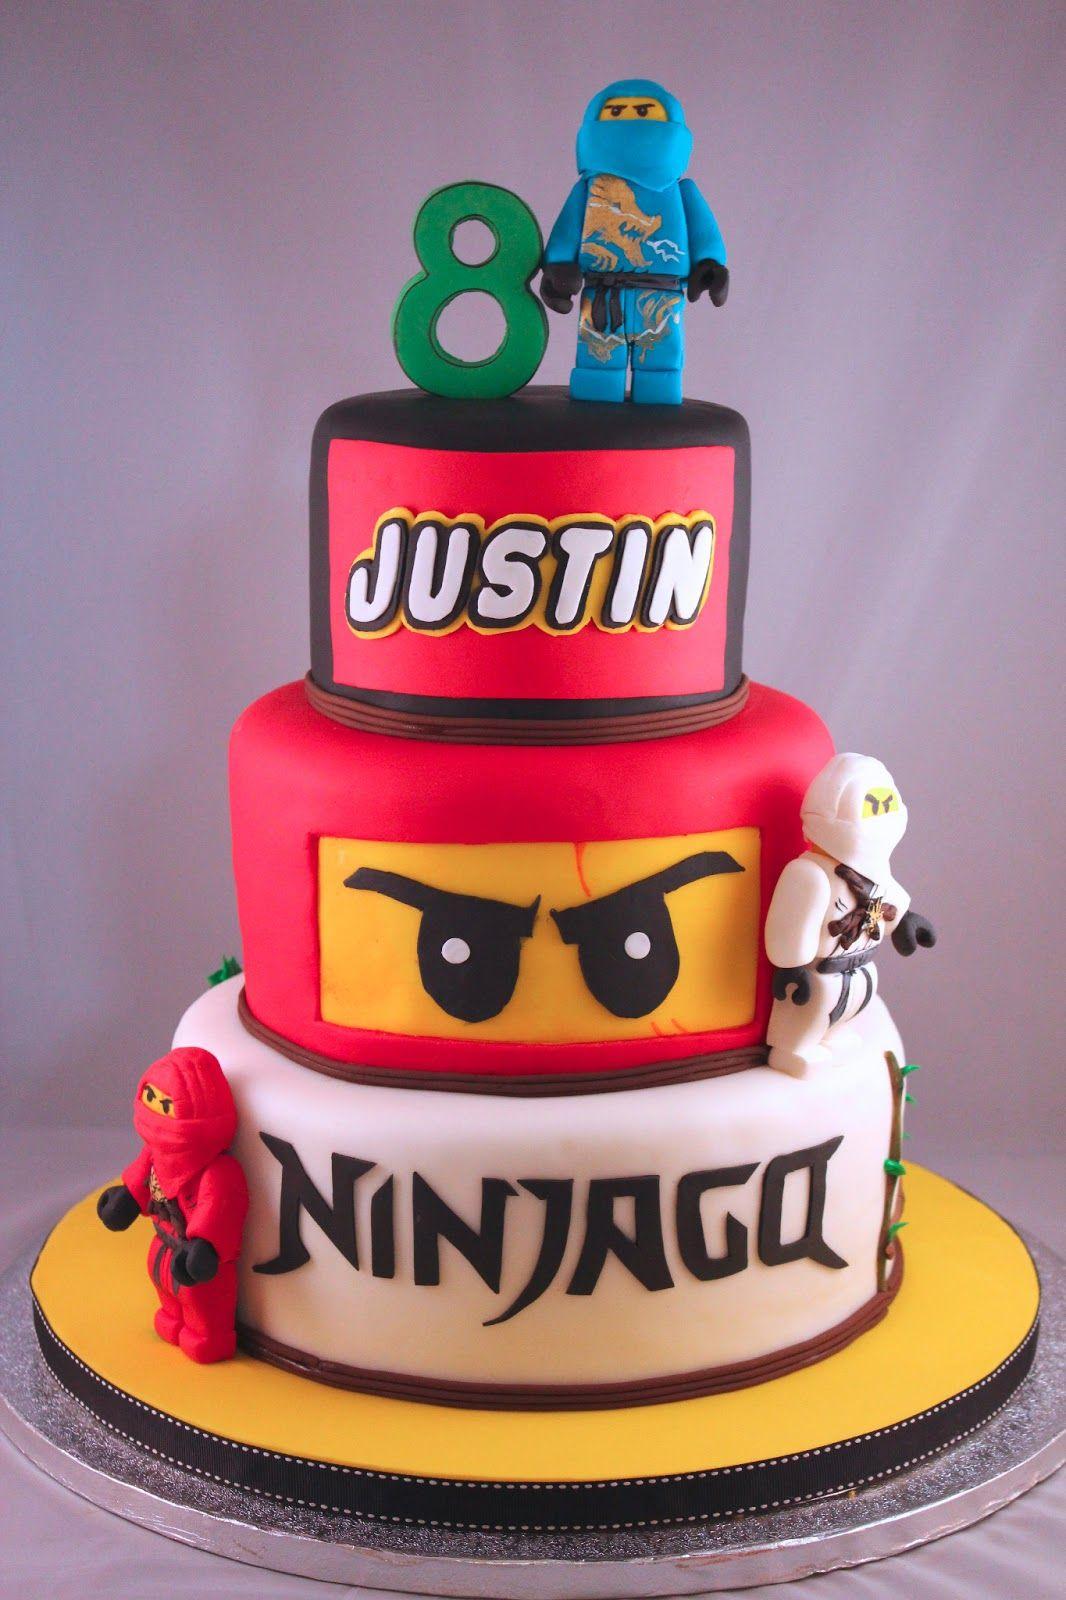 ninjago fondant cakes | ... print insipirated. The